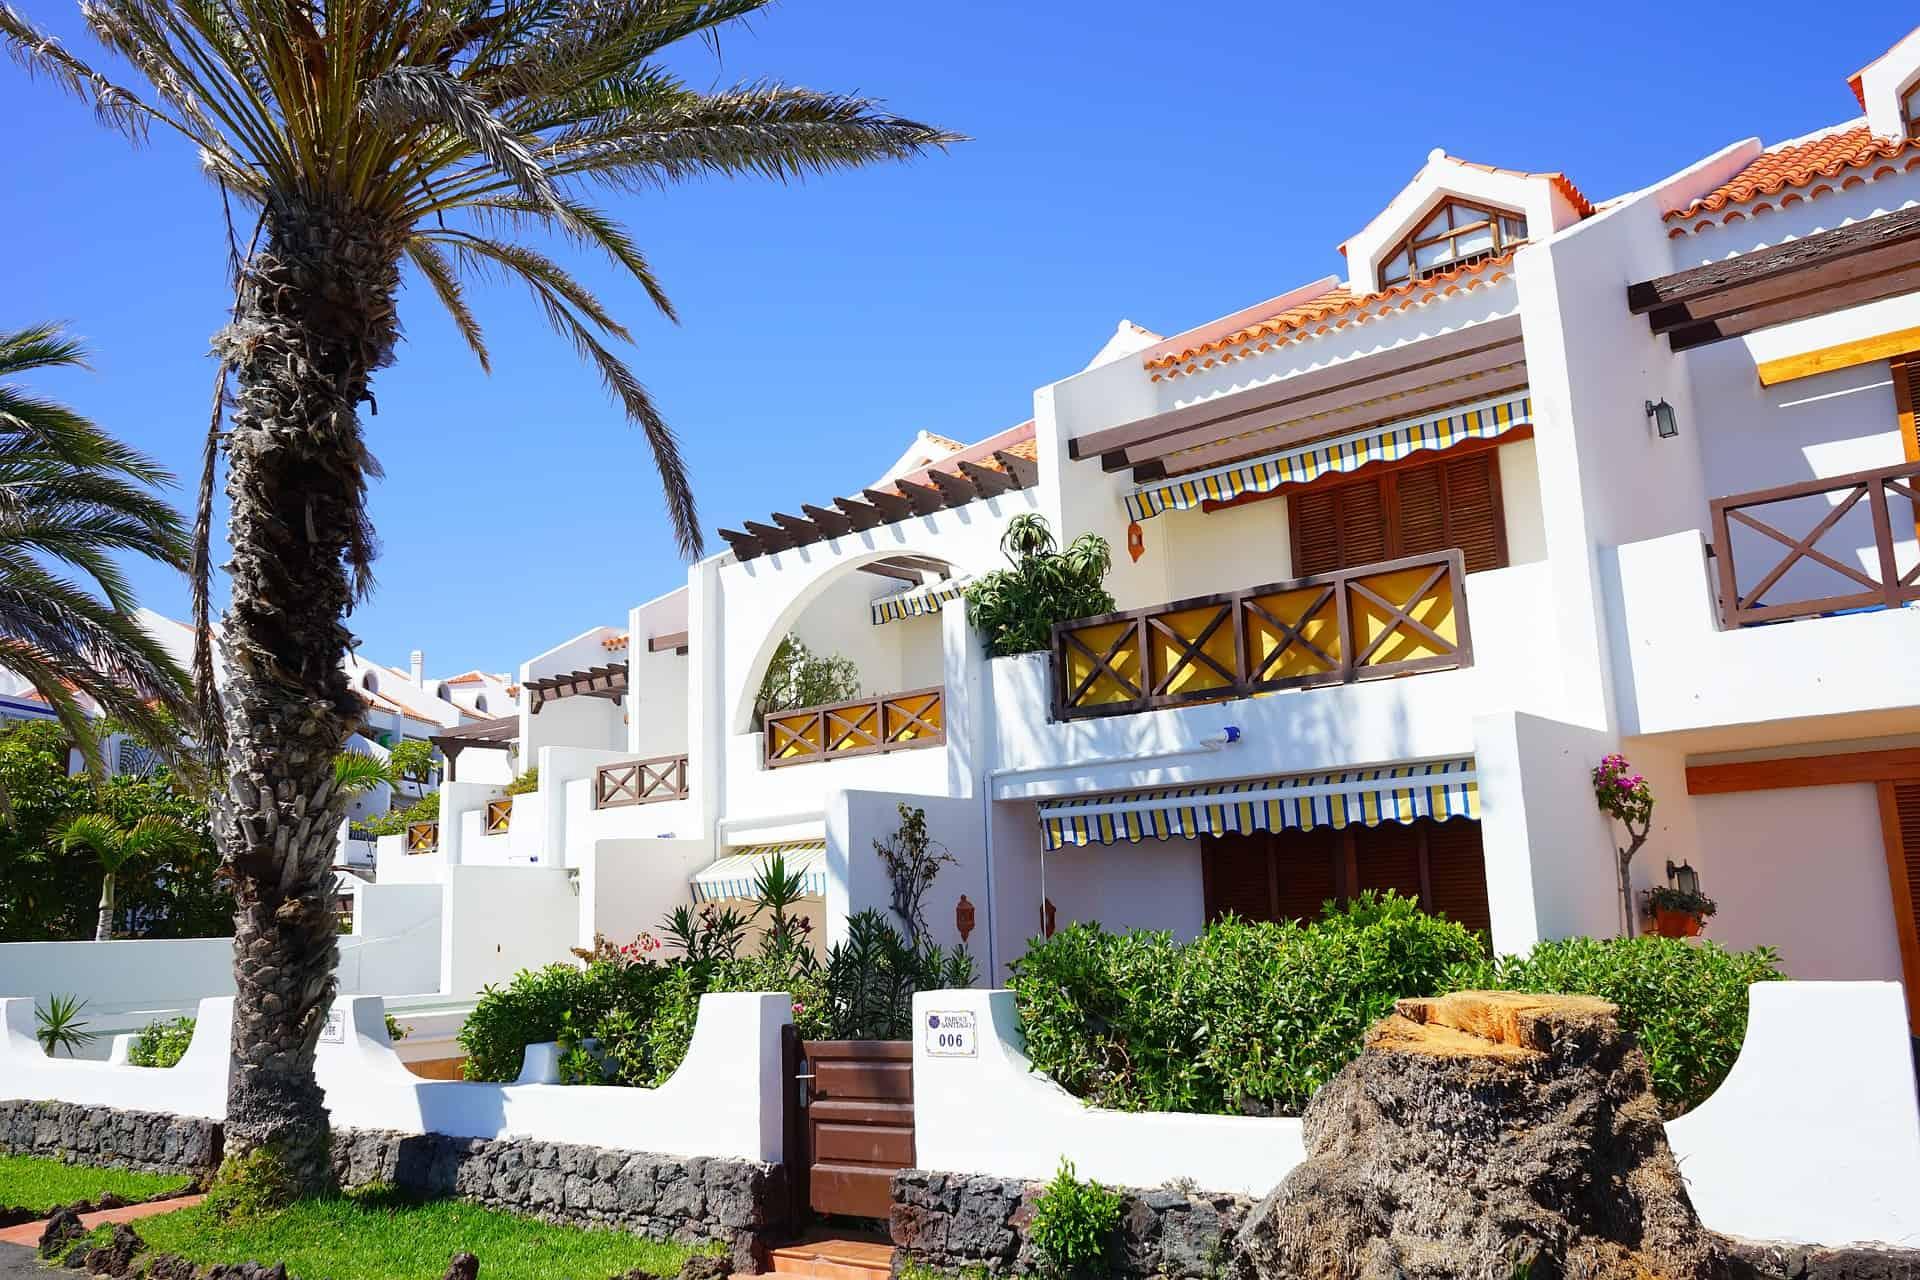 Visites gay de Tenerife